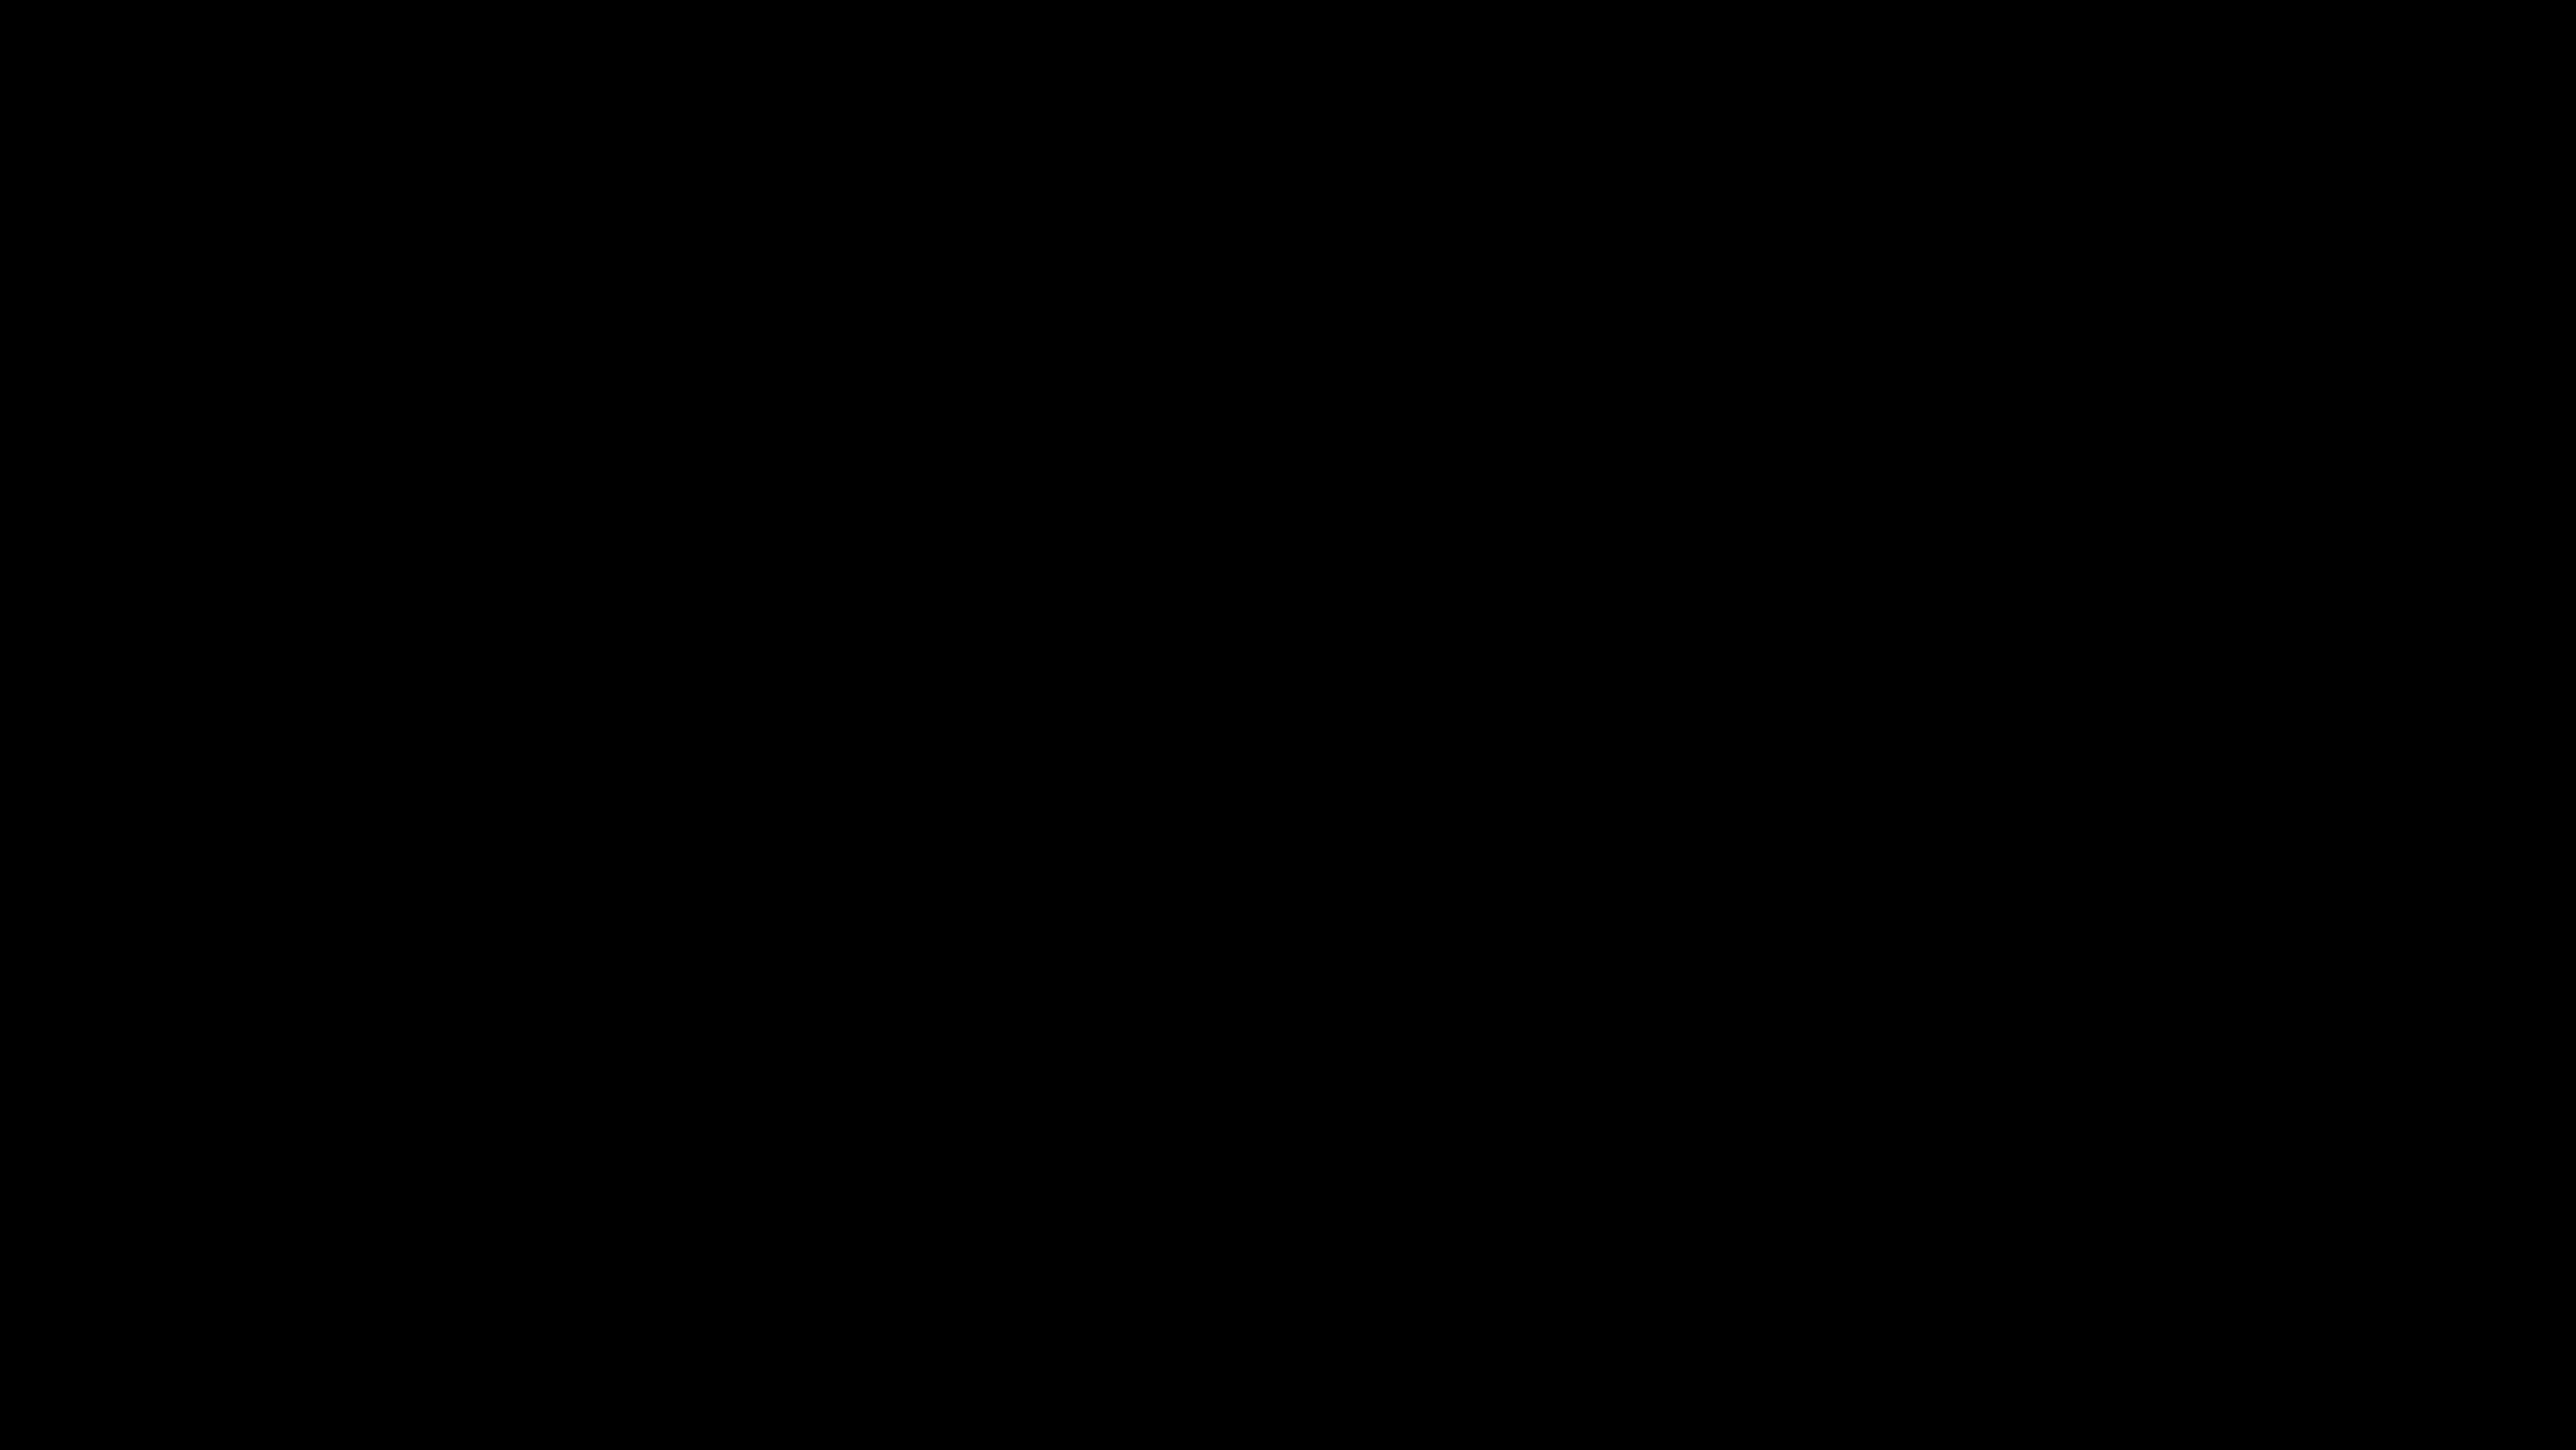 P1000091